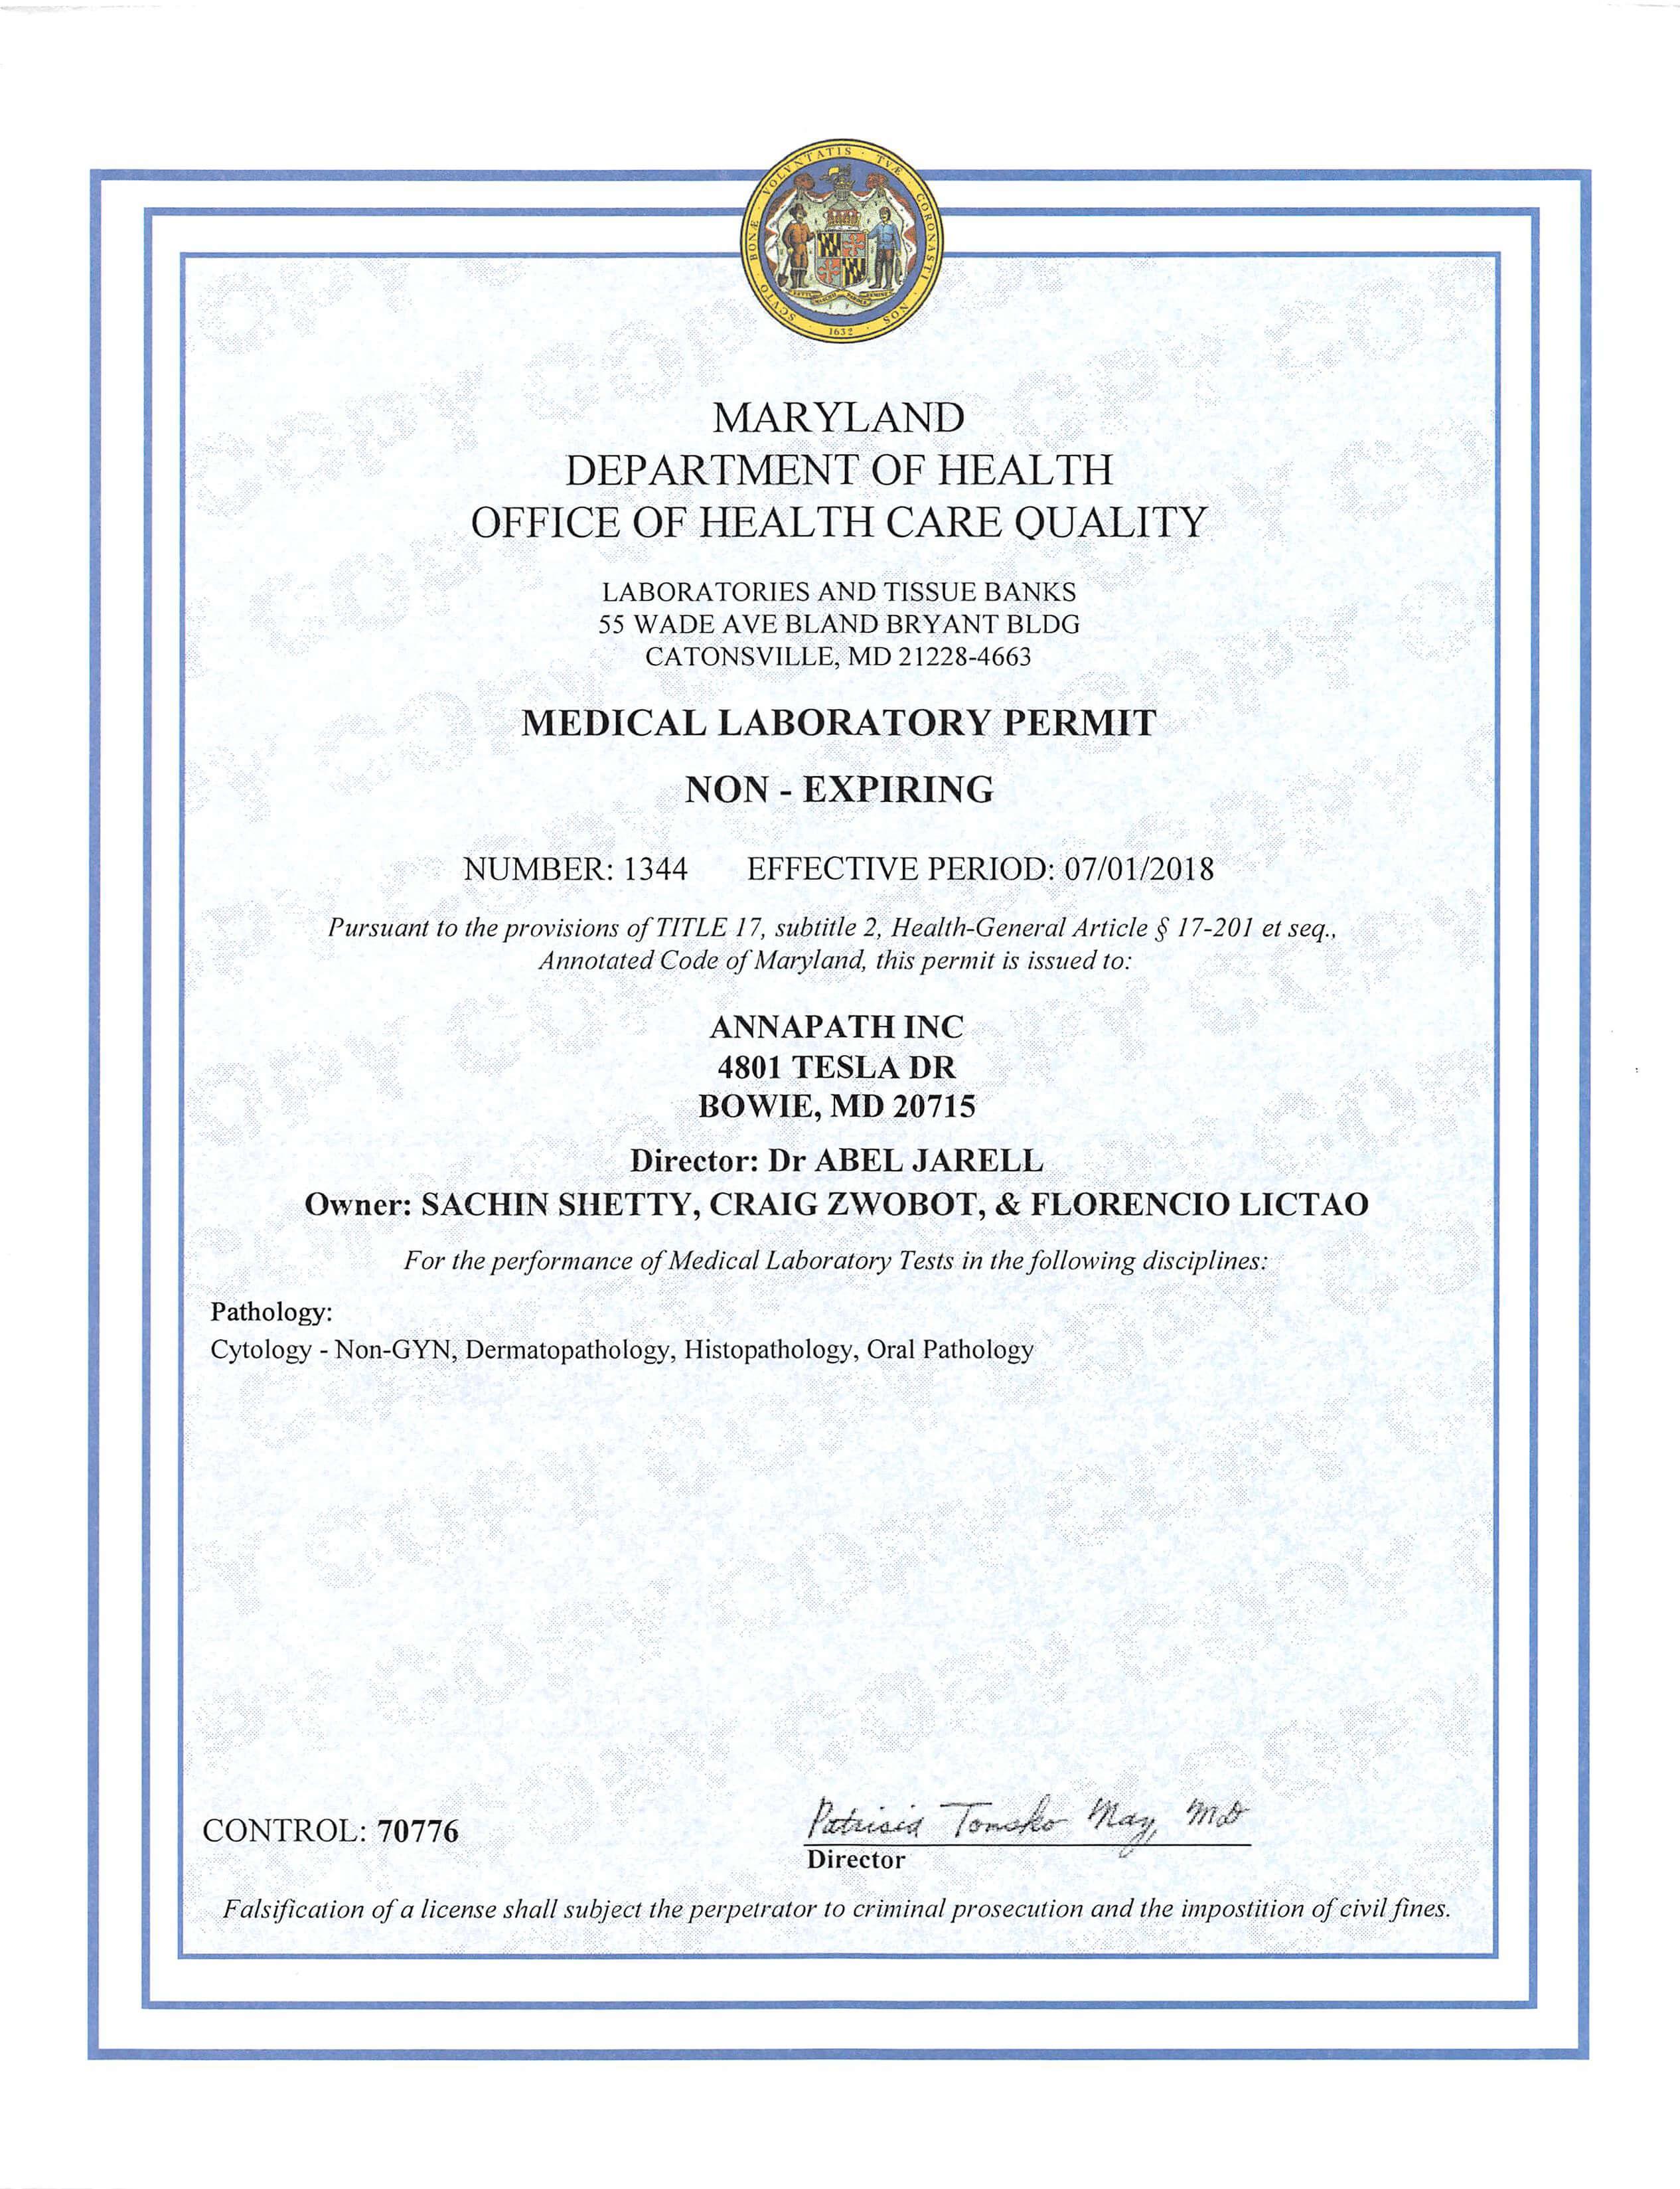 DHMH_Certificate_MD_NonExp